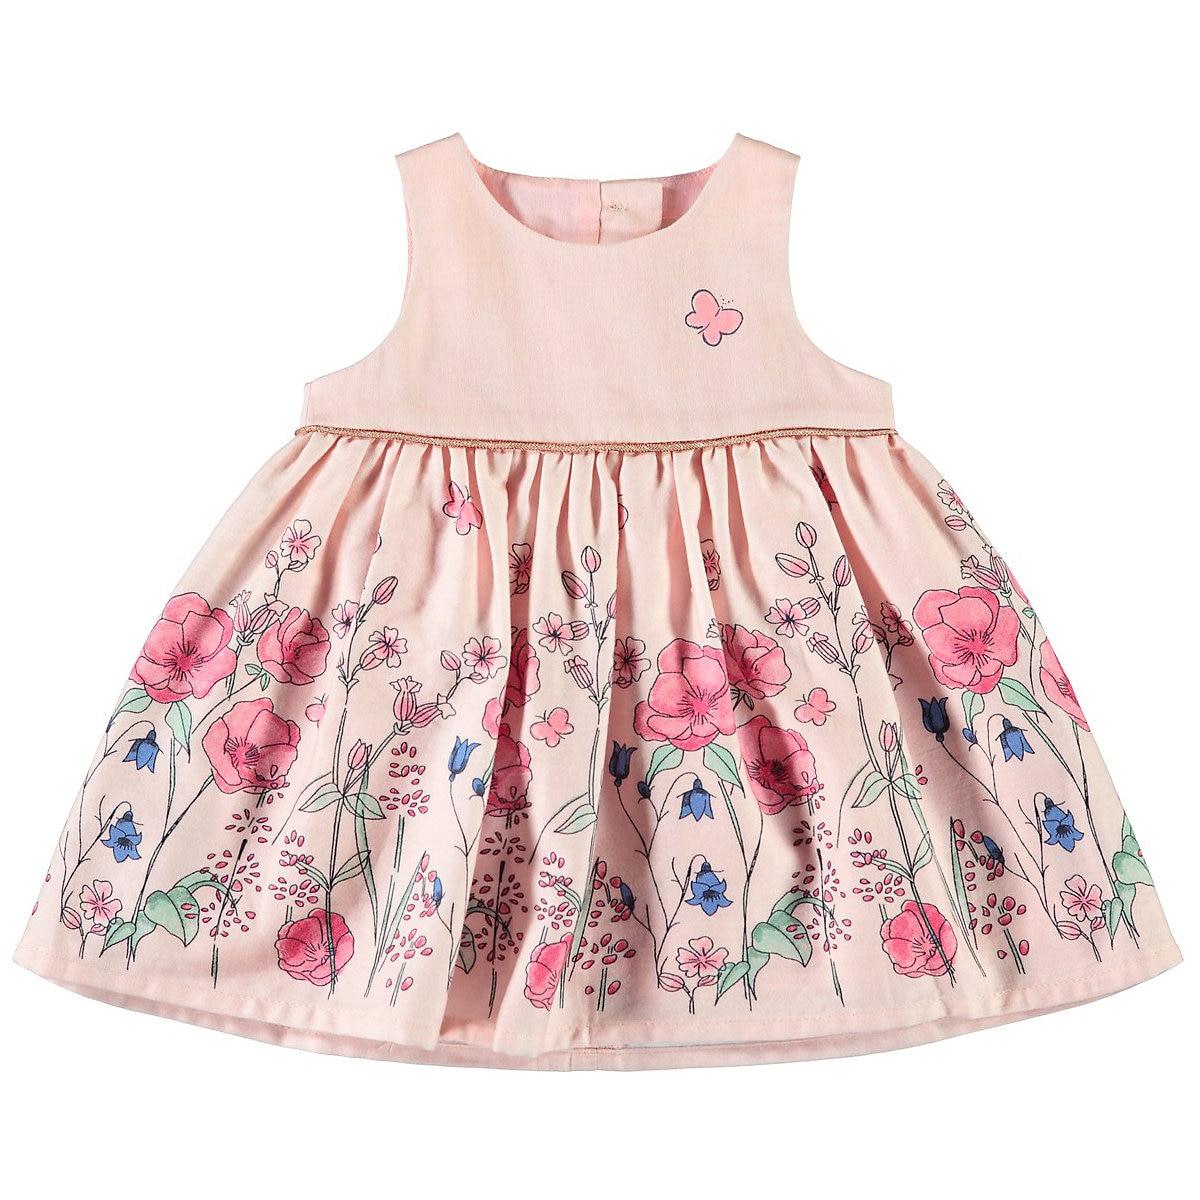 Фото - NAME IT Dresses 10623584 dress for girls baby clothing name it dresses 10626724 dress for girls baby clothing